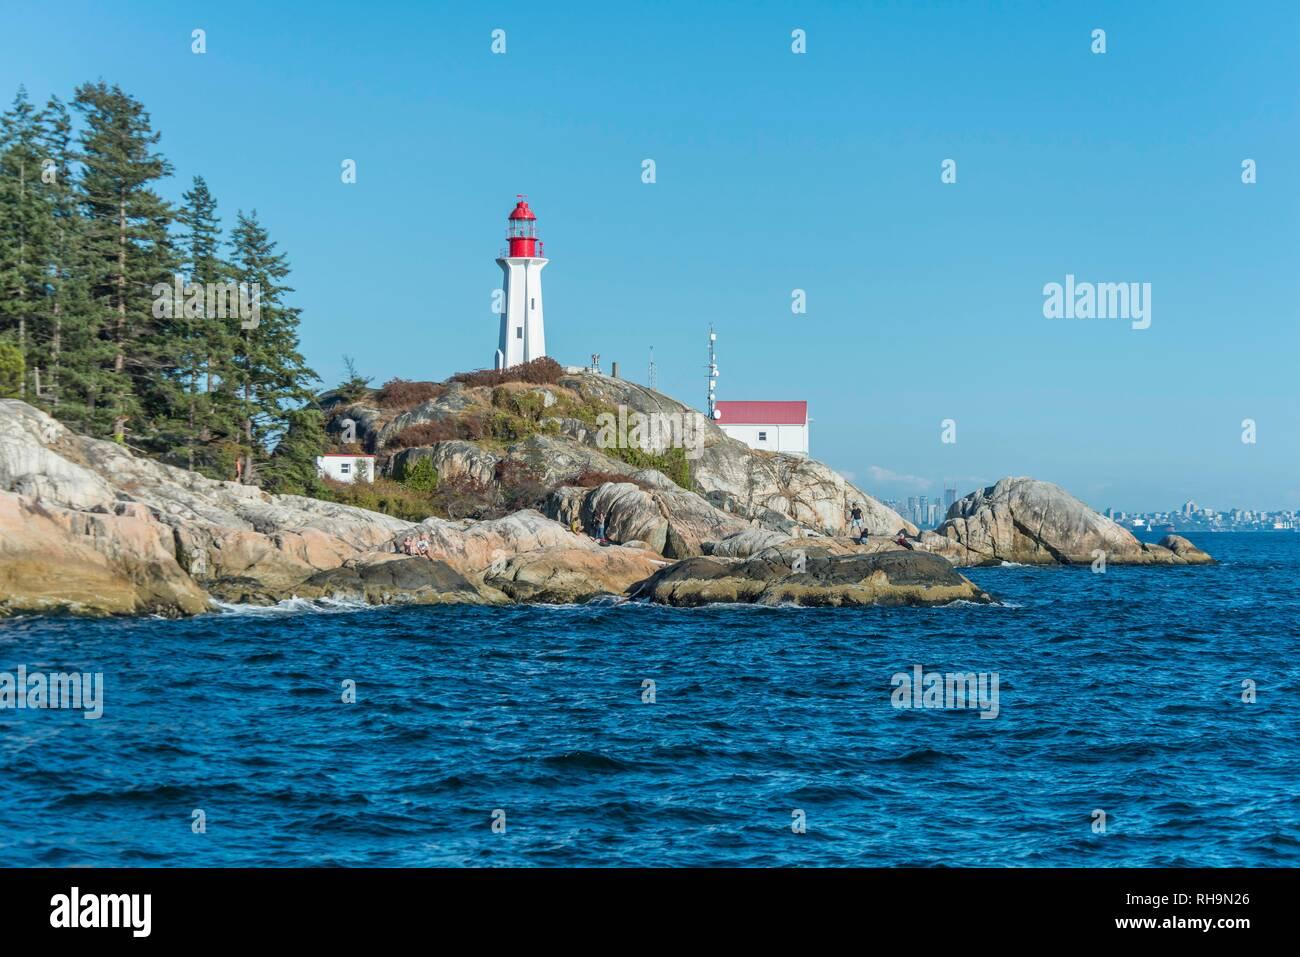 Faro, punto Atkinson faro, Howe Sound, Vancouver, British Columbia, Canada Foto Stock